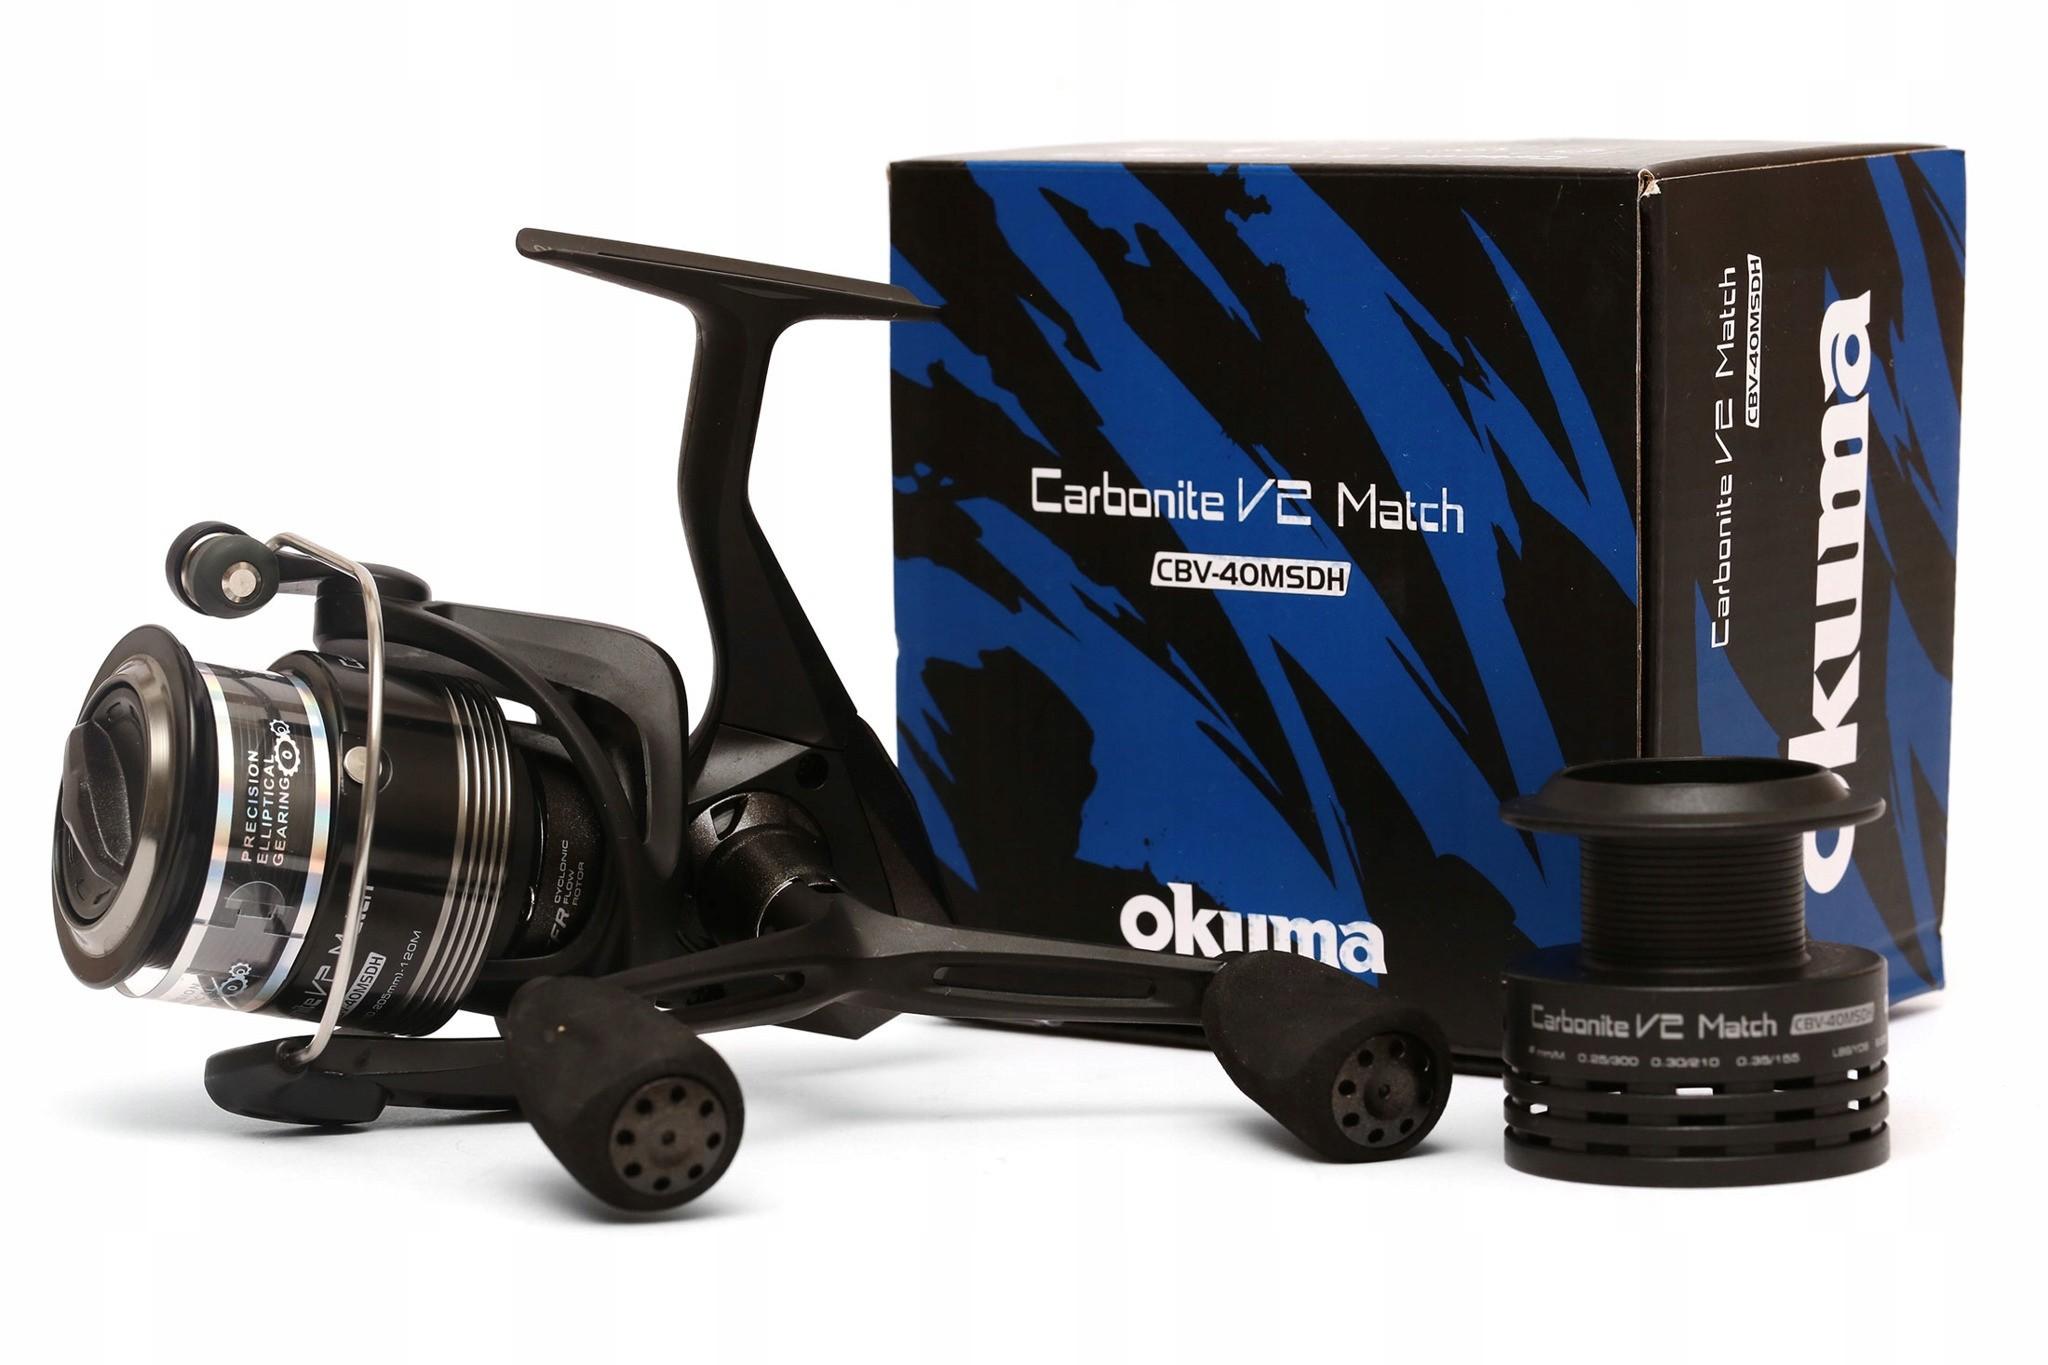 Rola Okuma Carbonite V2 Match CBV-40MRSDH